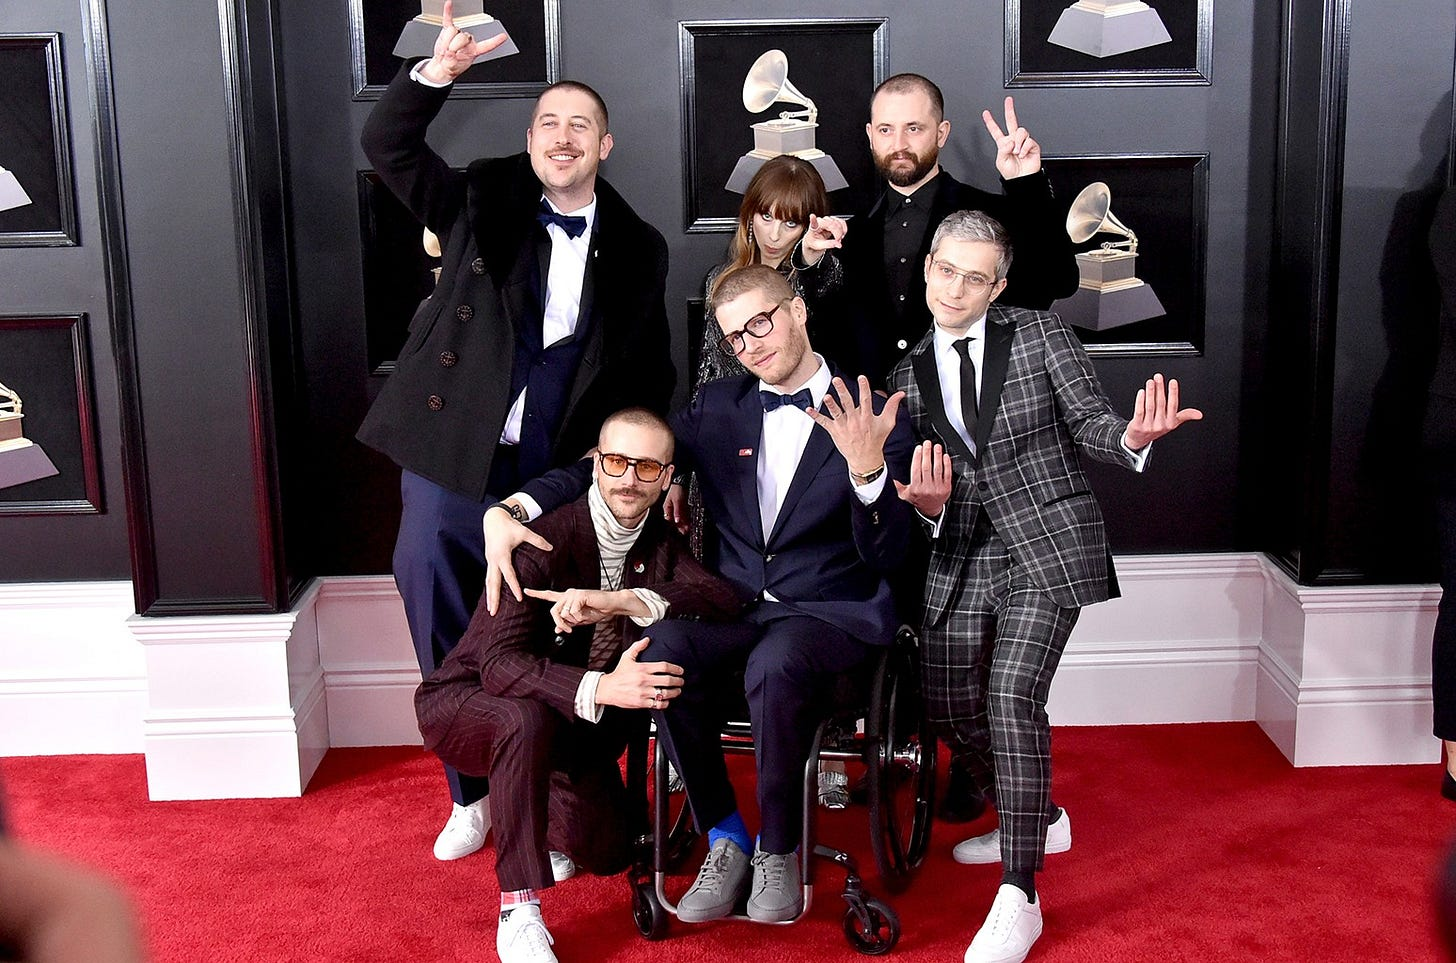 Portugal. The Man Grammys 2018 Interview: 'We're All About Hard Work' |  Billboard | Billboard